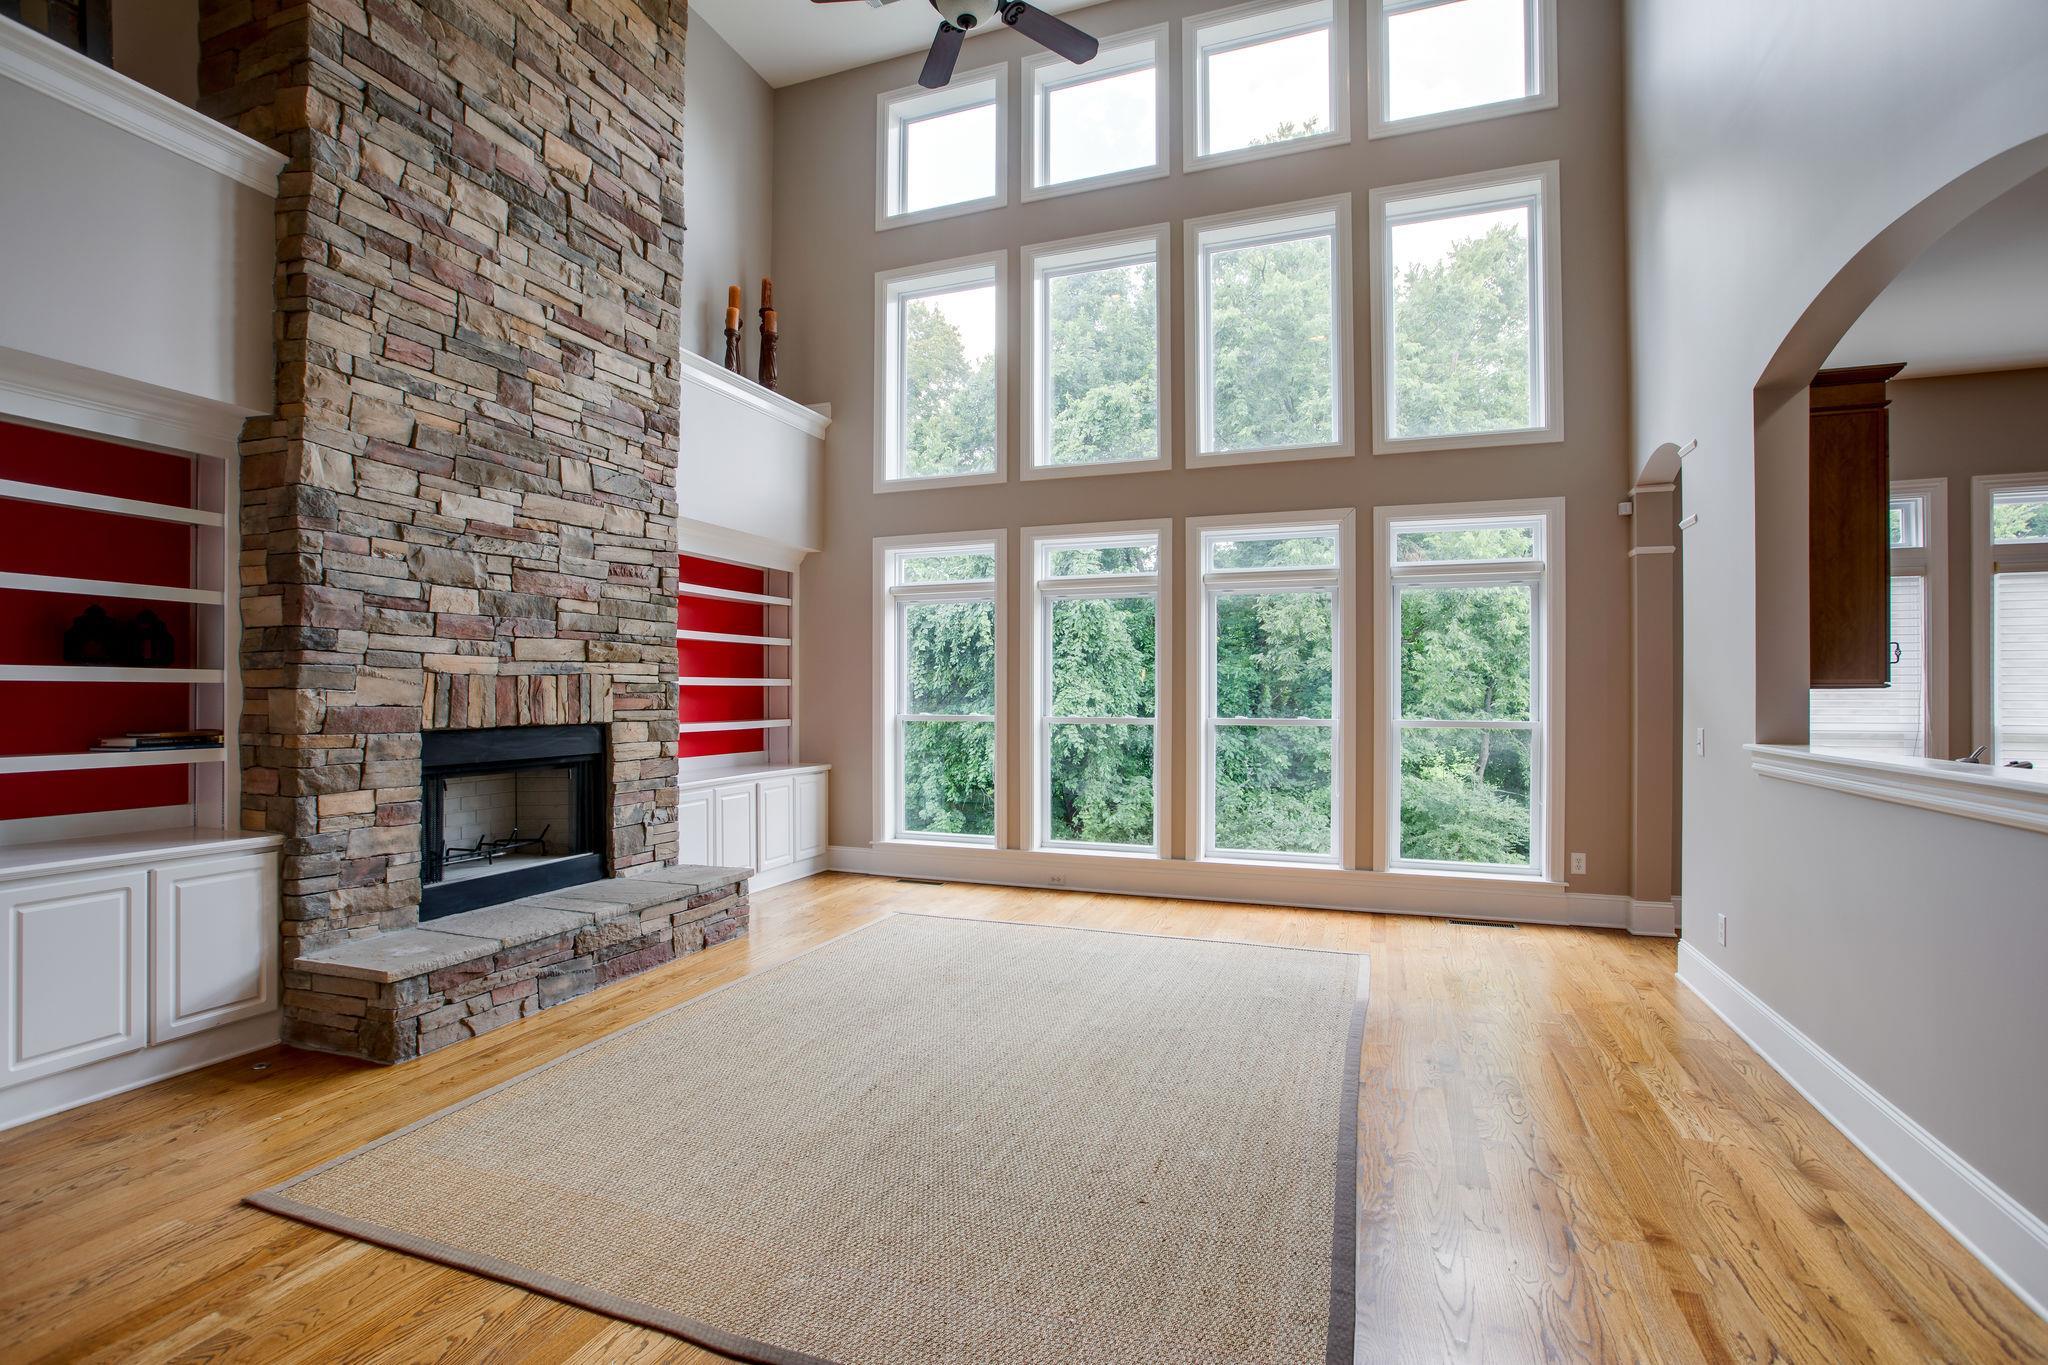 1707 Tensaw Cir, Franklin, TN 37067 - Franklin, TN real estate listing